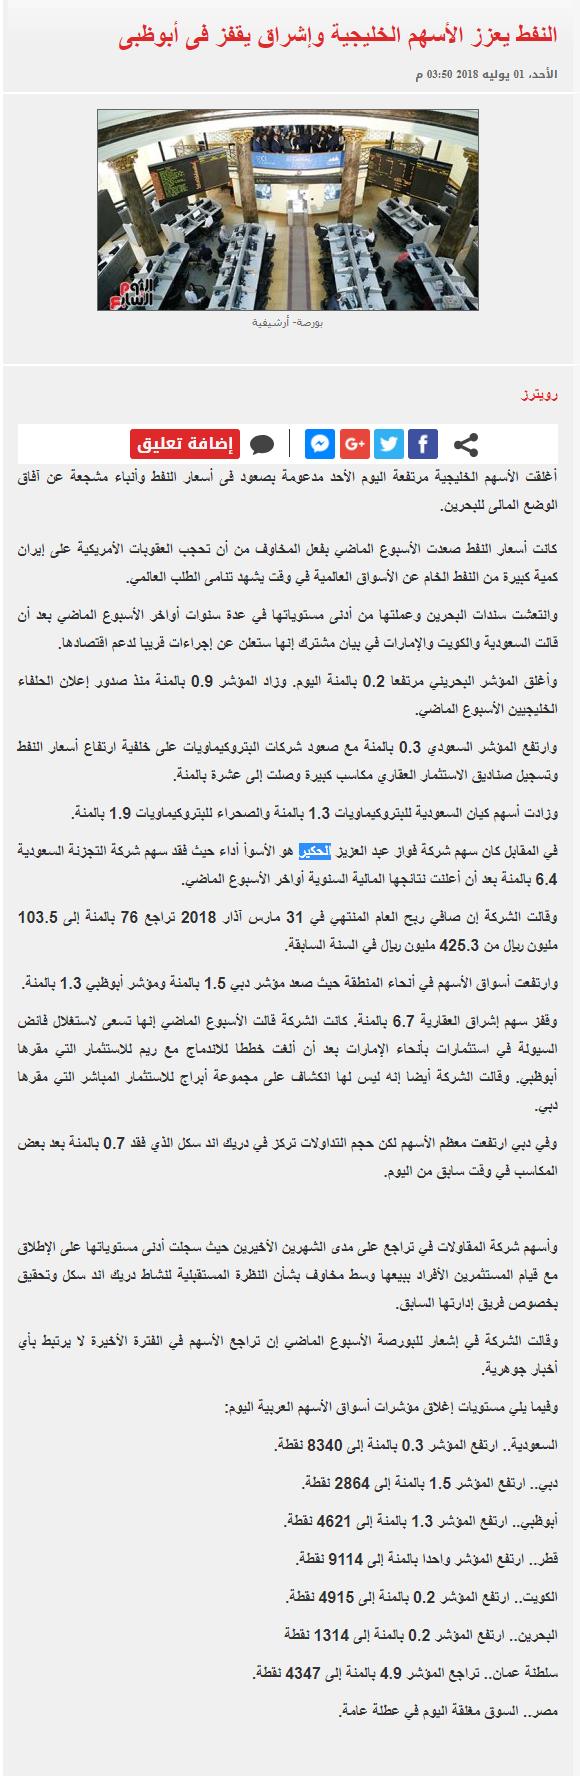 FireShot Capture 963 - النفط يعزز الأسهم الخليجية وإشراق يقف_ - https___www.youm7.com_story_2018_7.png